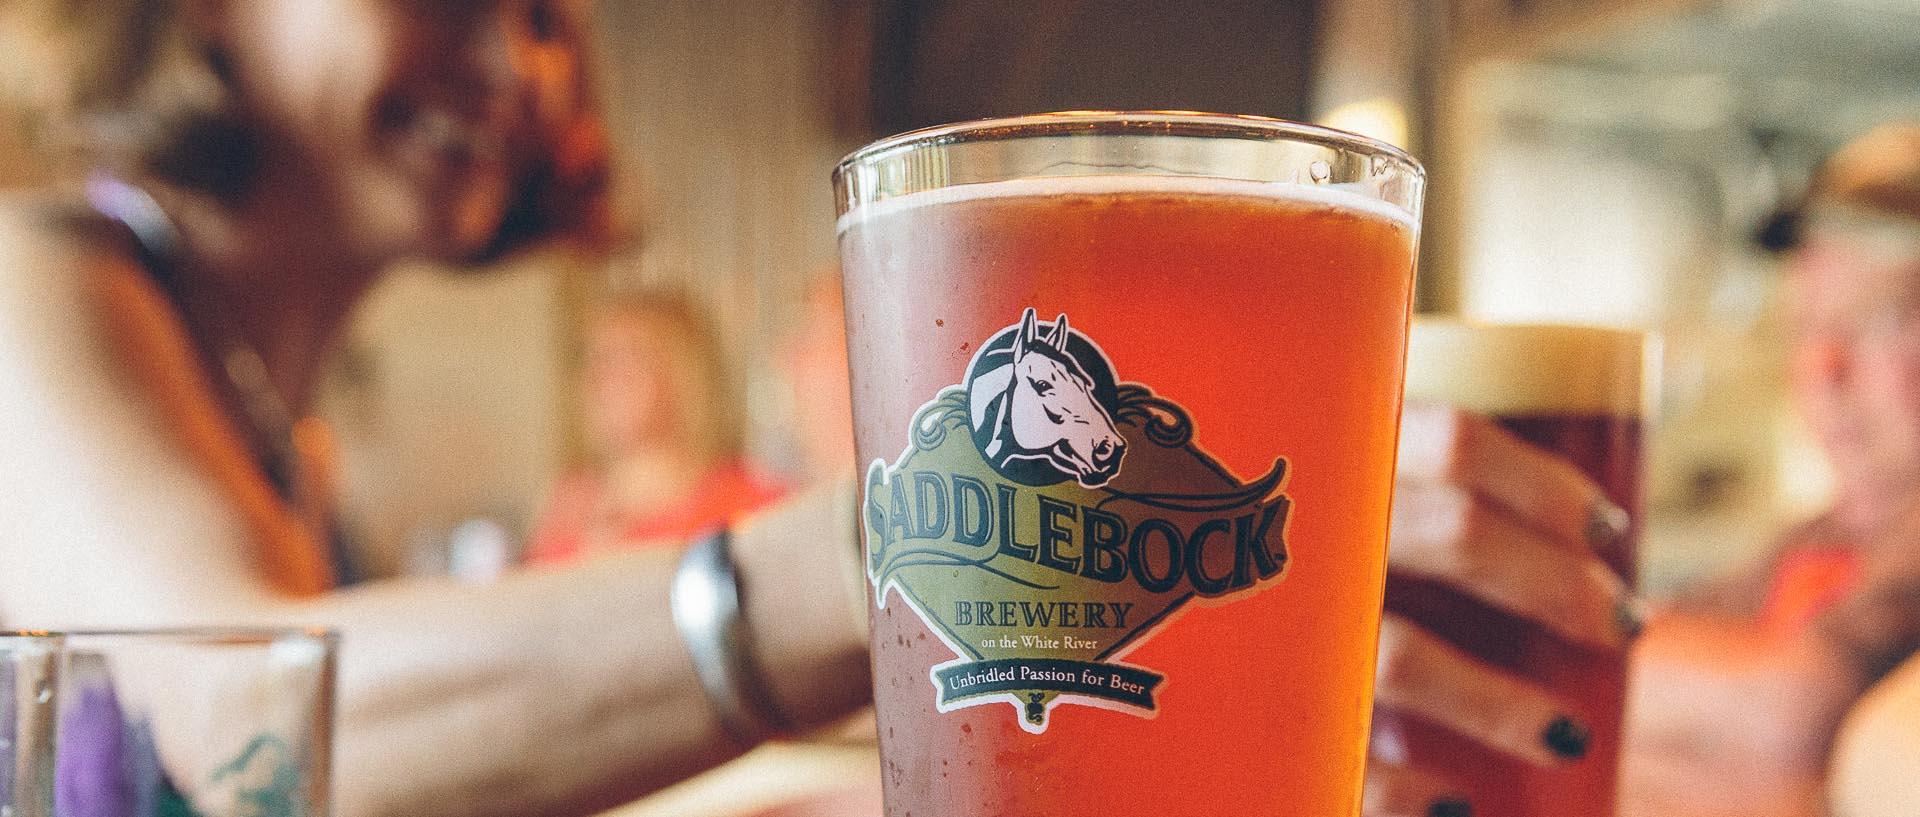 Saddlebock brewery fayetteville